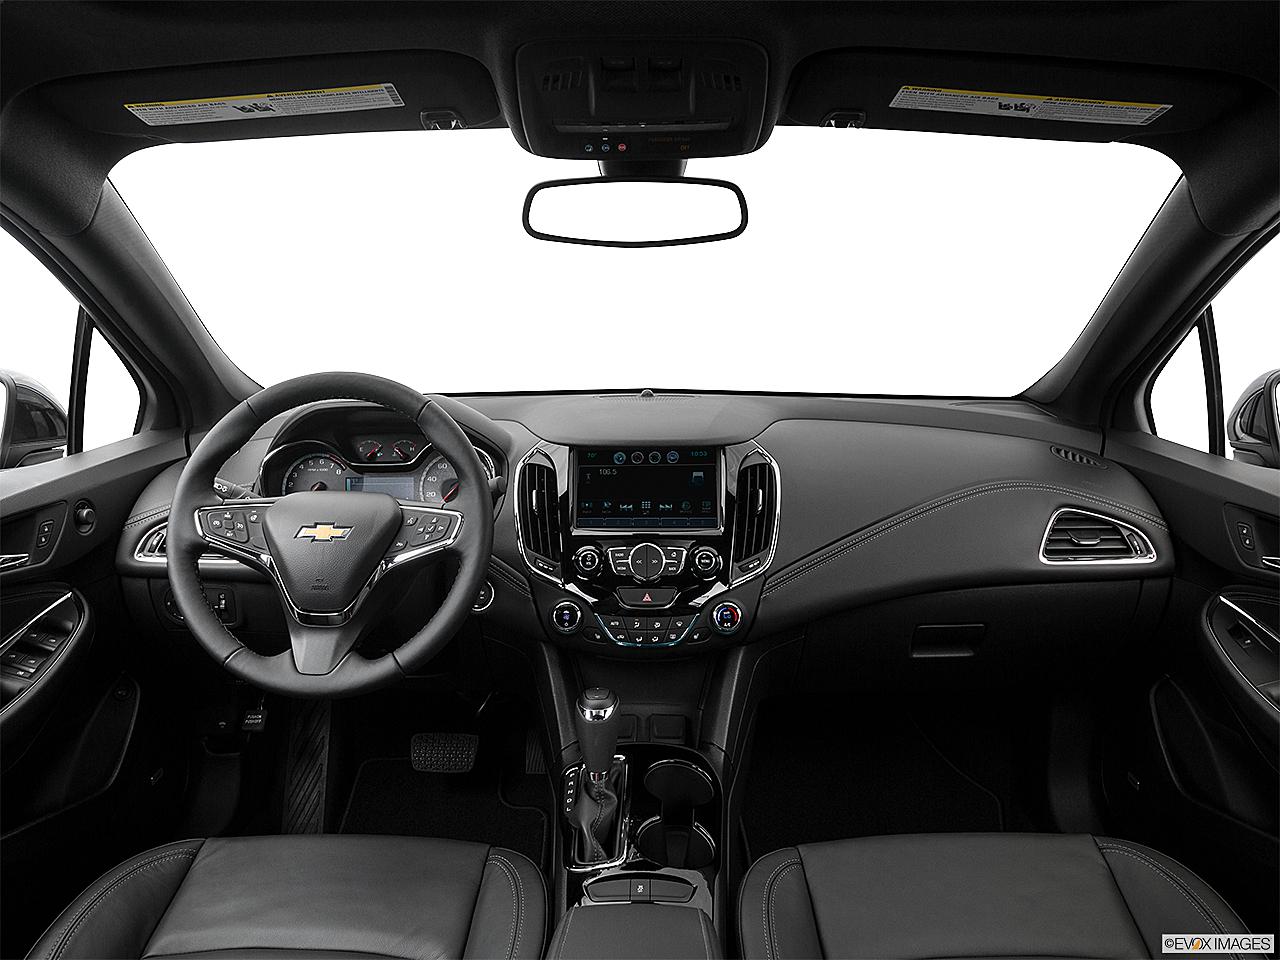 2016 Chevrolet Cruze LS Manual 4dr Sedan w/1SA - Research - GrooveCar